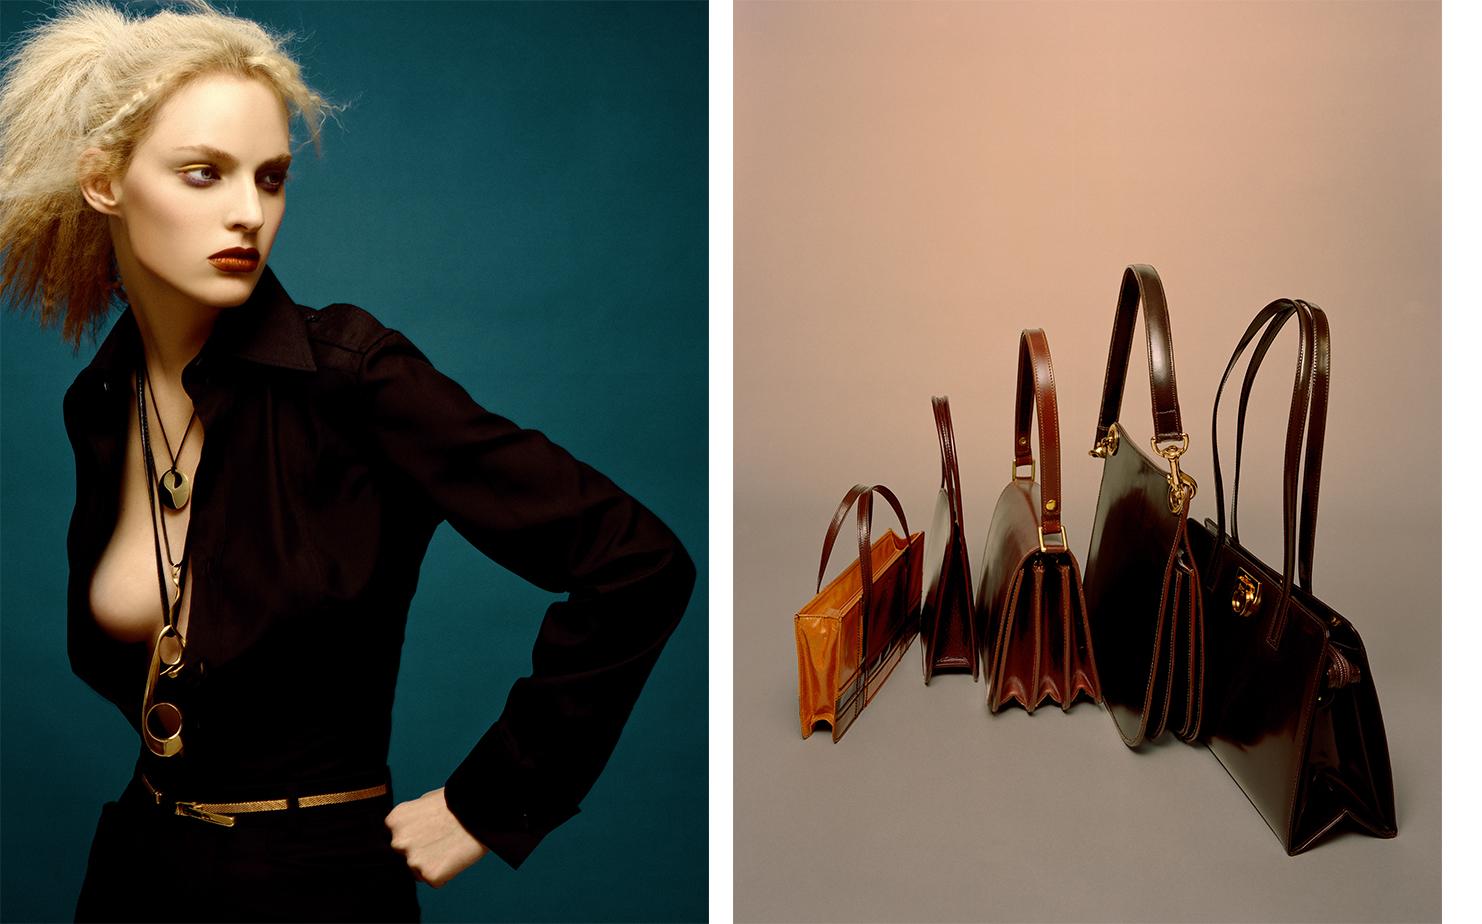 British Vogue GOLDEN BROWN   FASHION EDITOR Tiina Laakkonen MODEL Amy Wesson